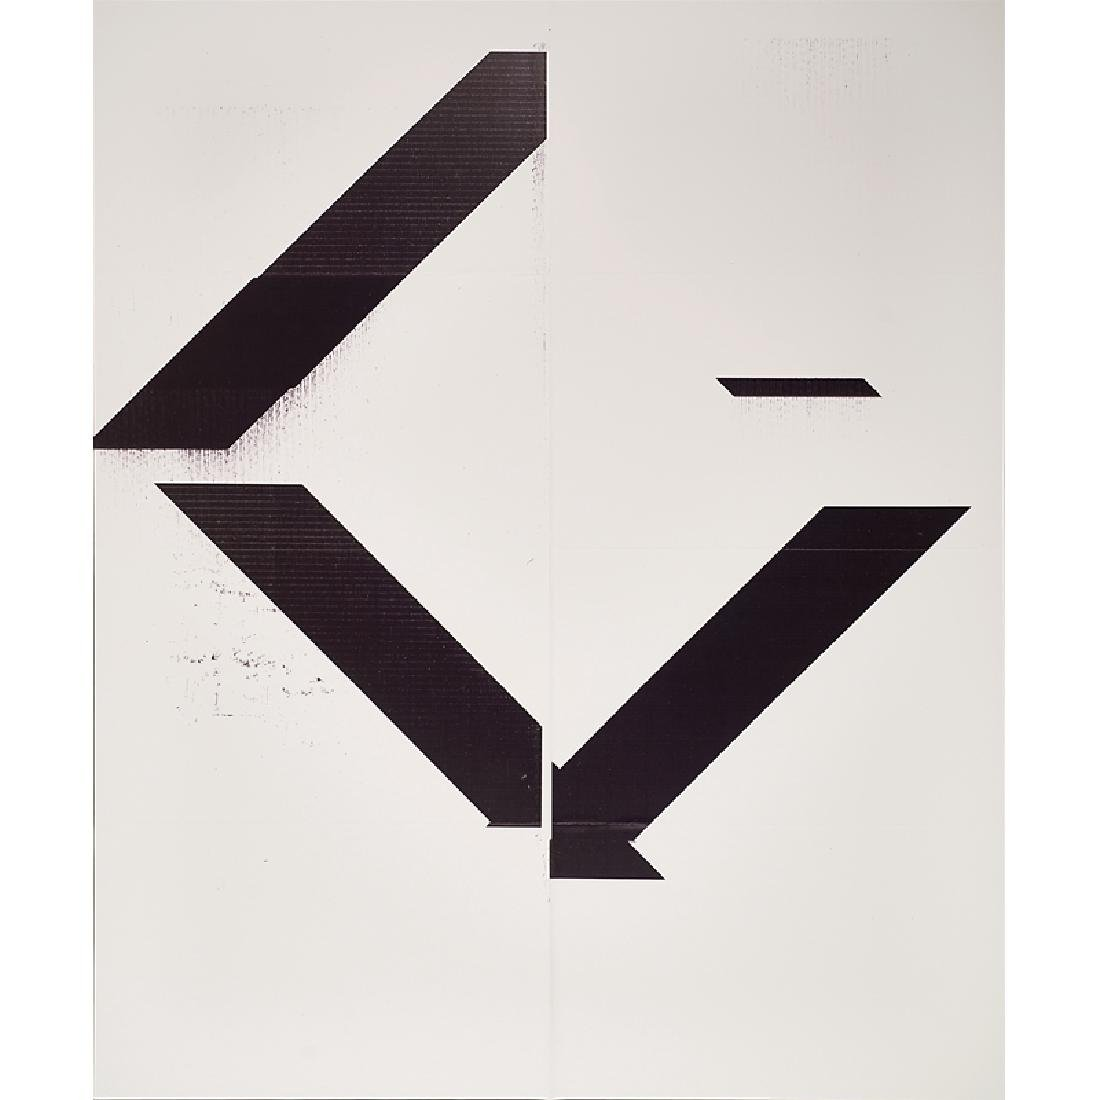 Wade Guyton (American, b. 1972)